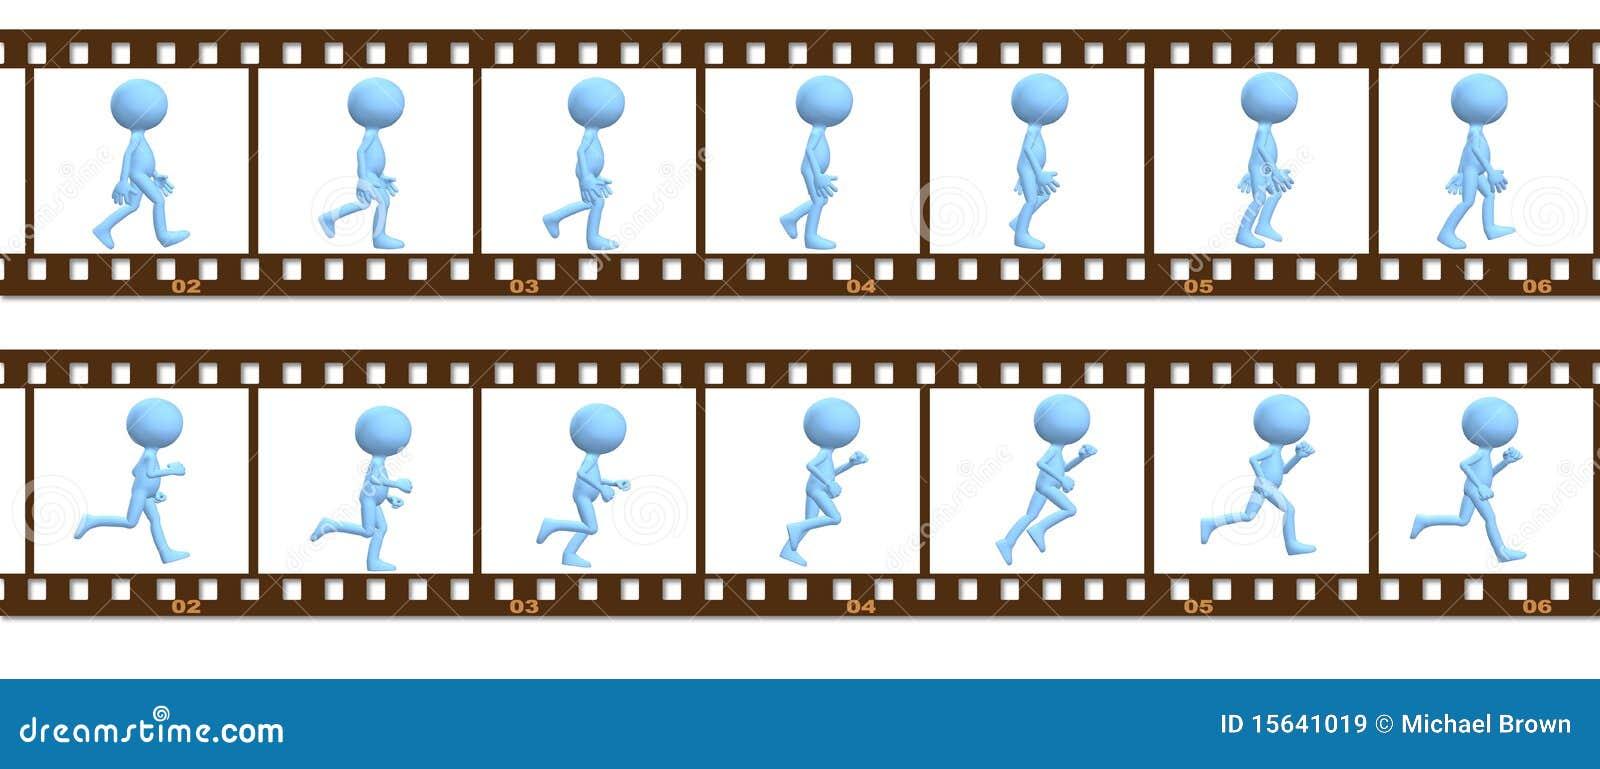 Animation Symbol People Walk Run In Cel Frames Stock Illustration ...